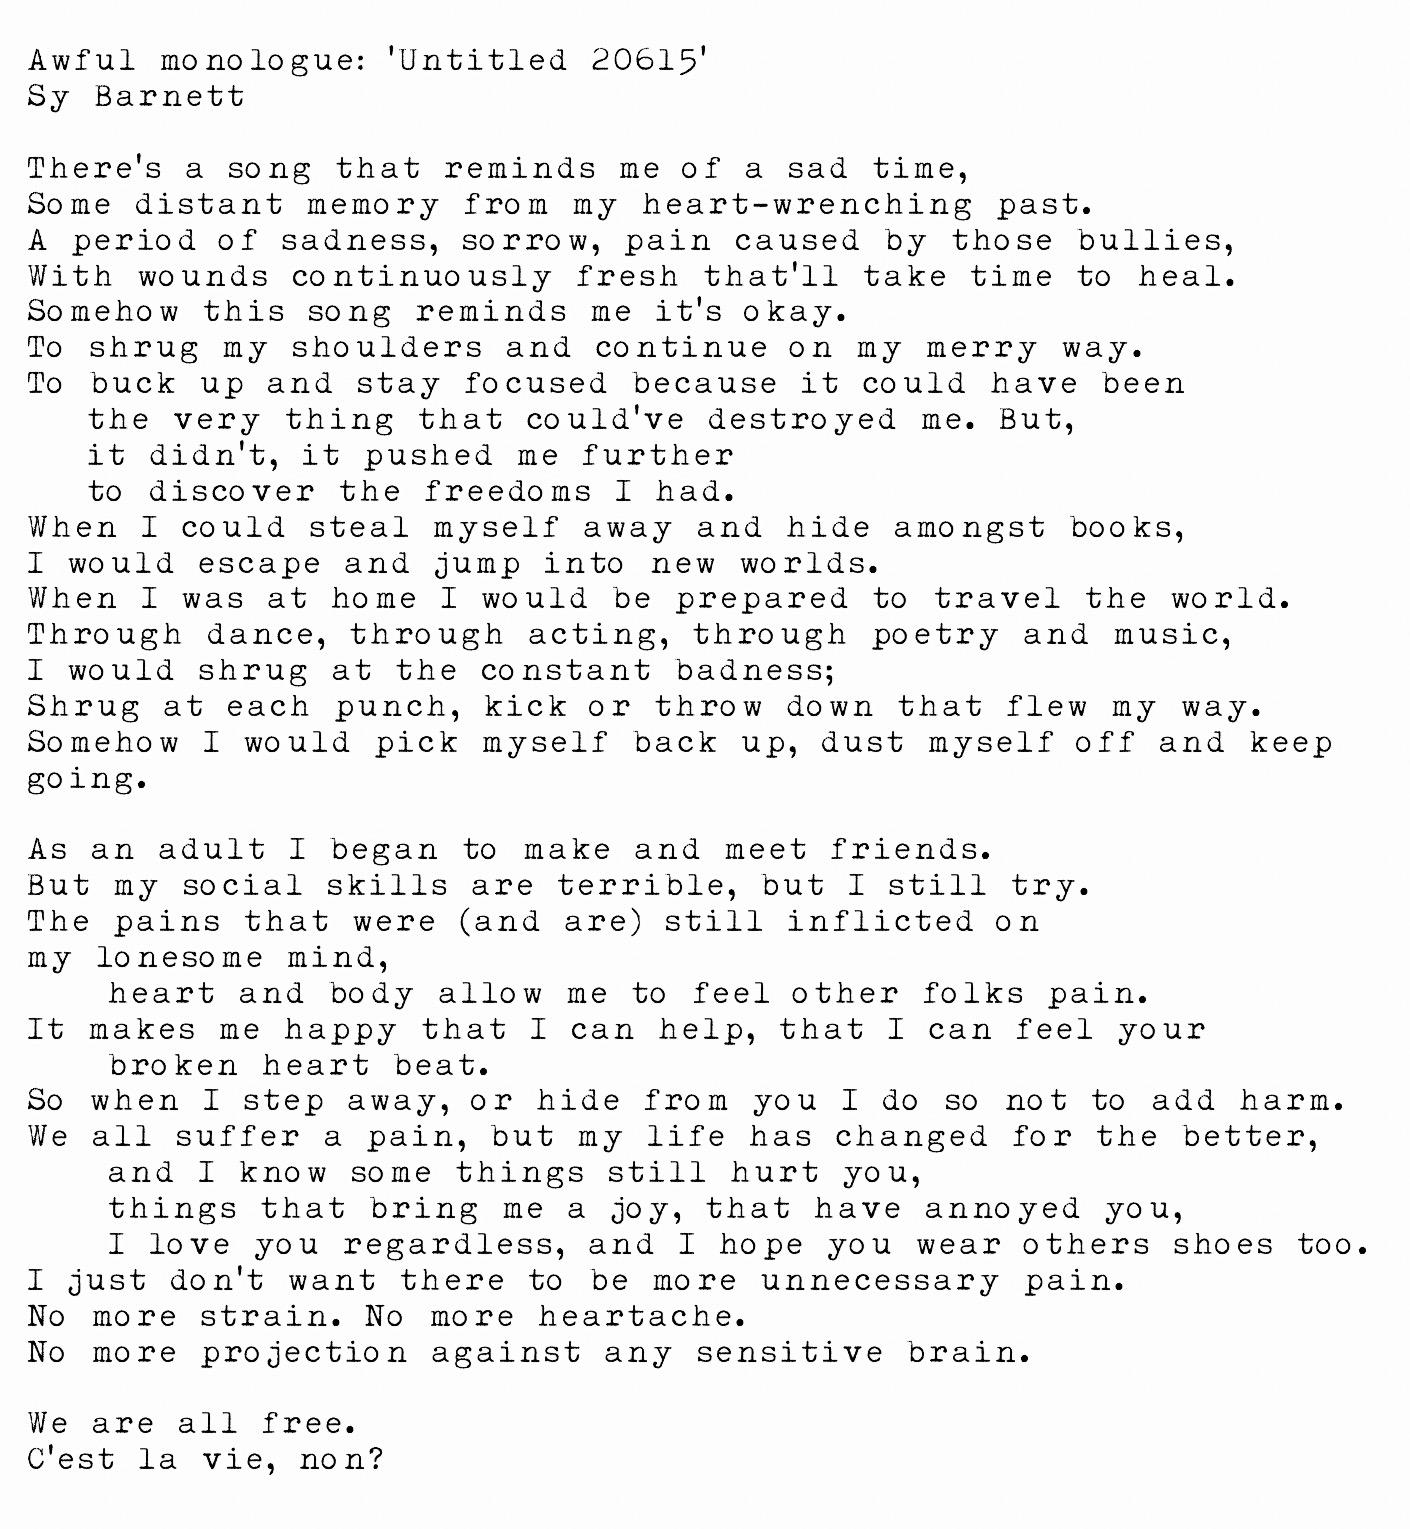 Monologue – Harlequin's Nook